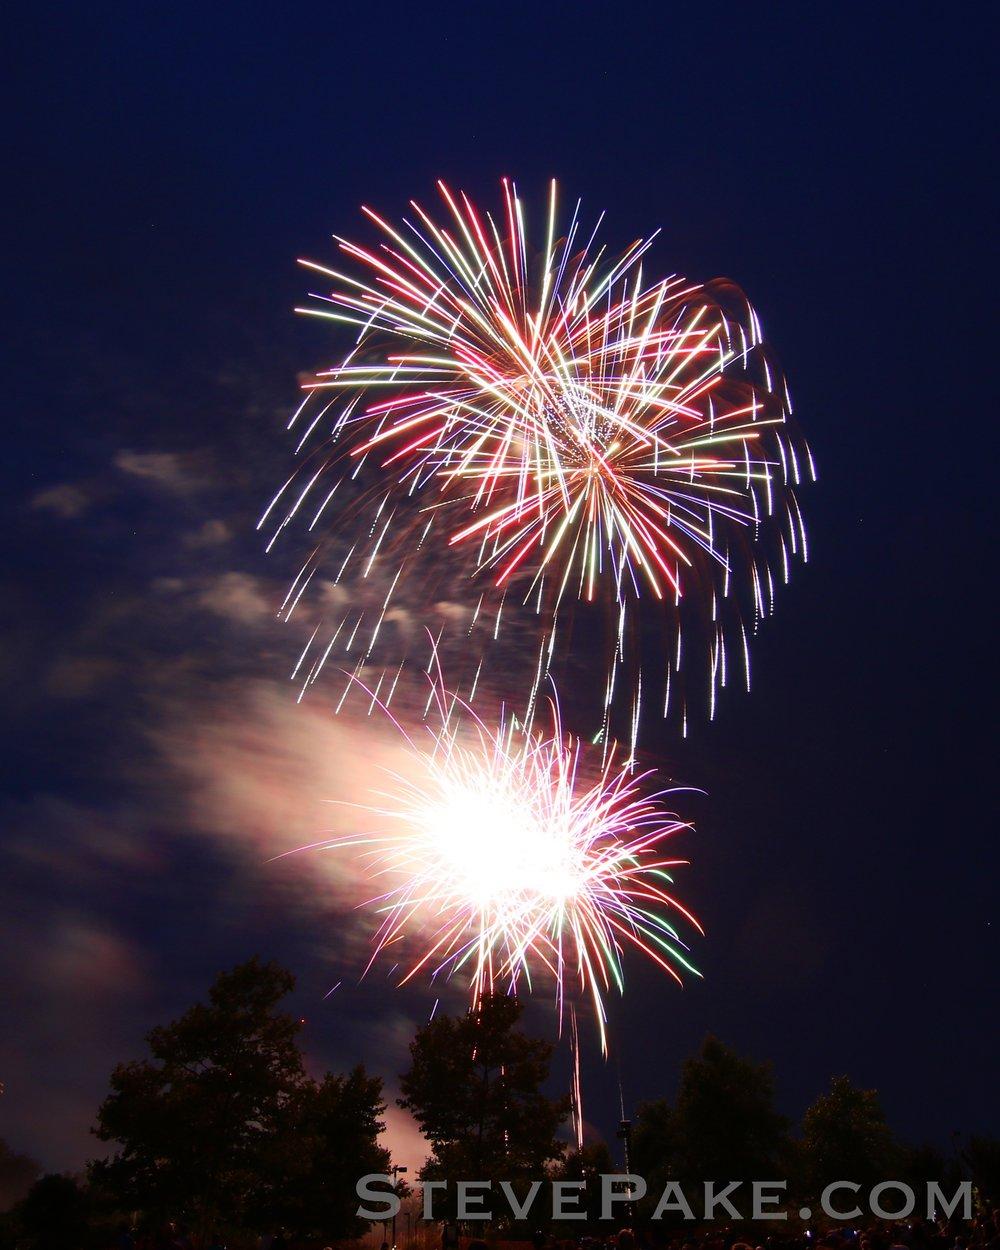 Fireworks2018_22_GE3A8530ap-HD-WM.jpg